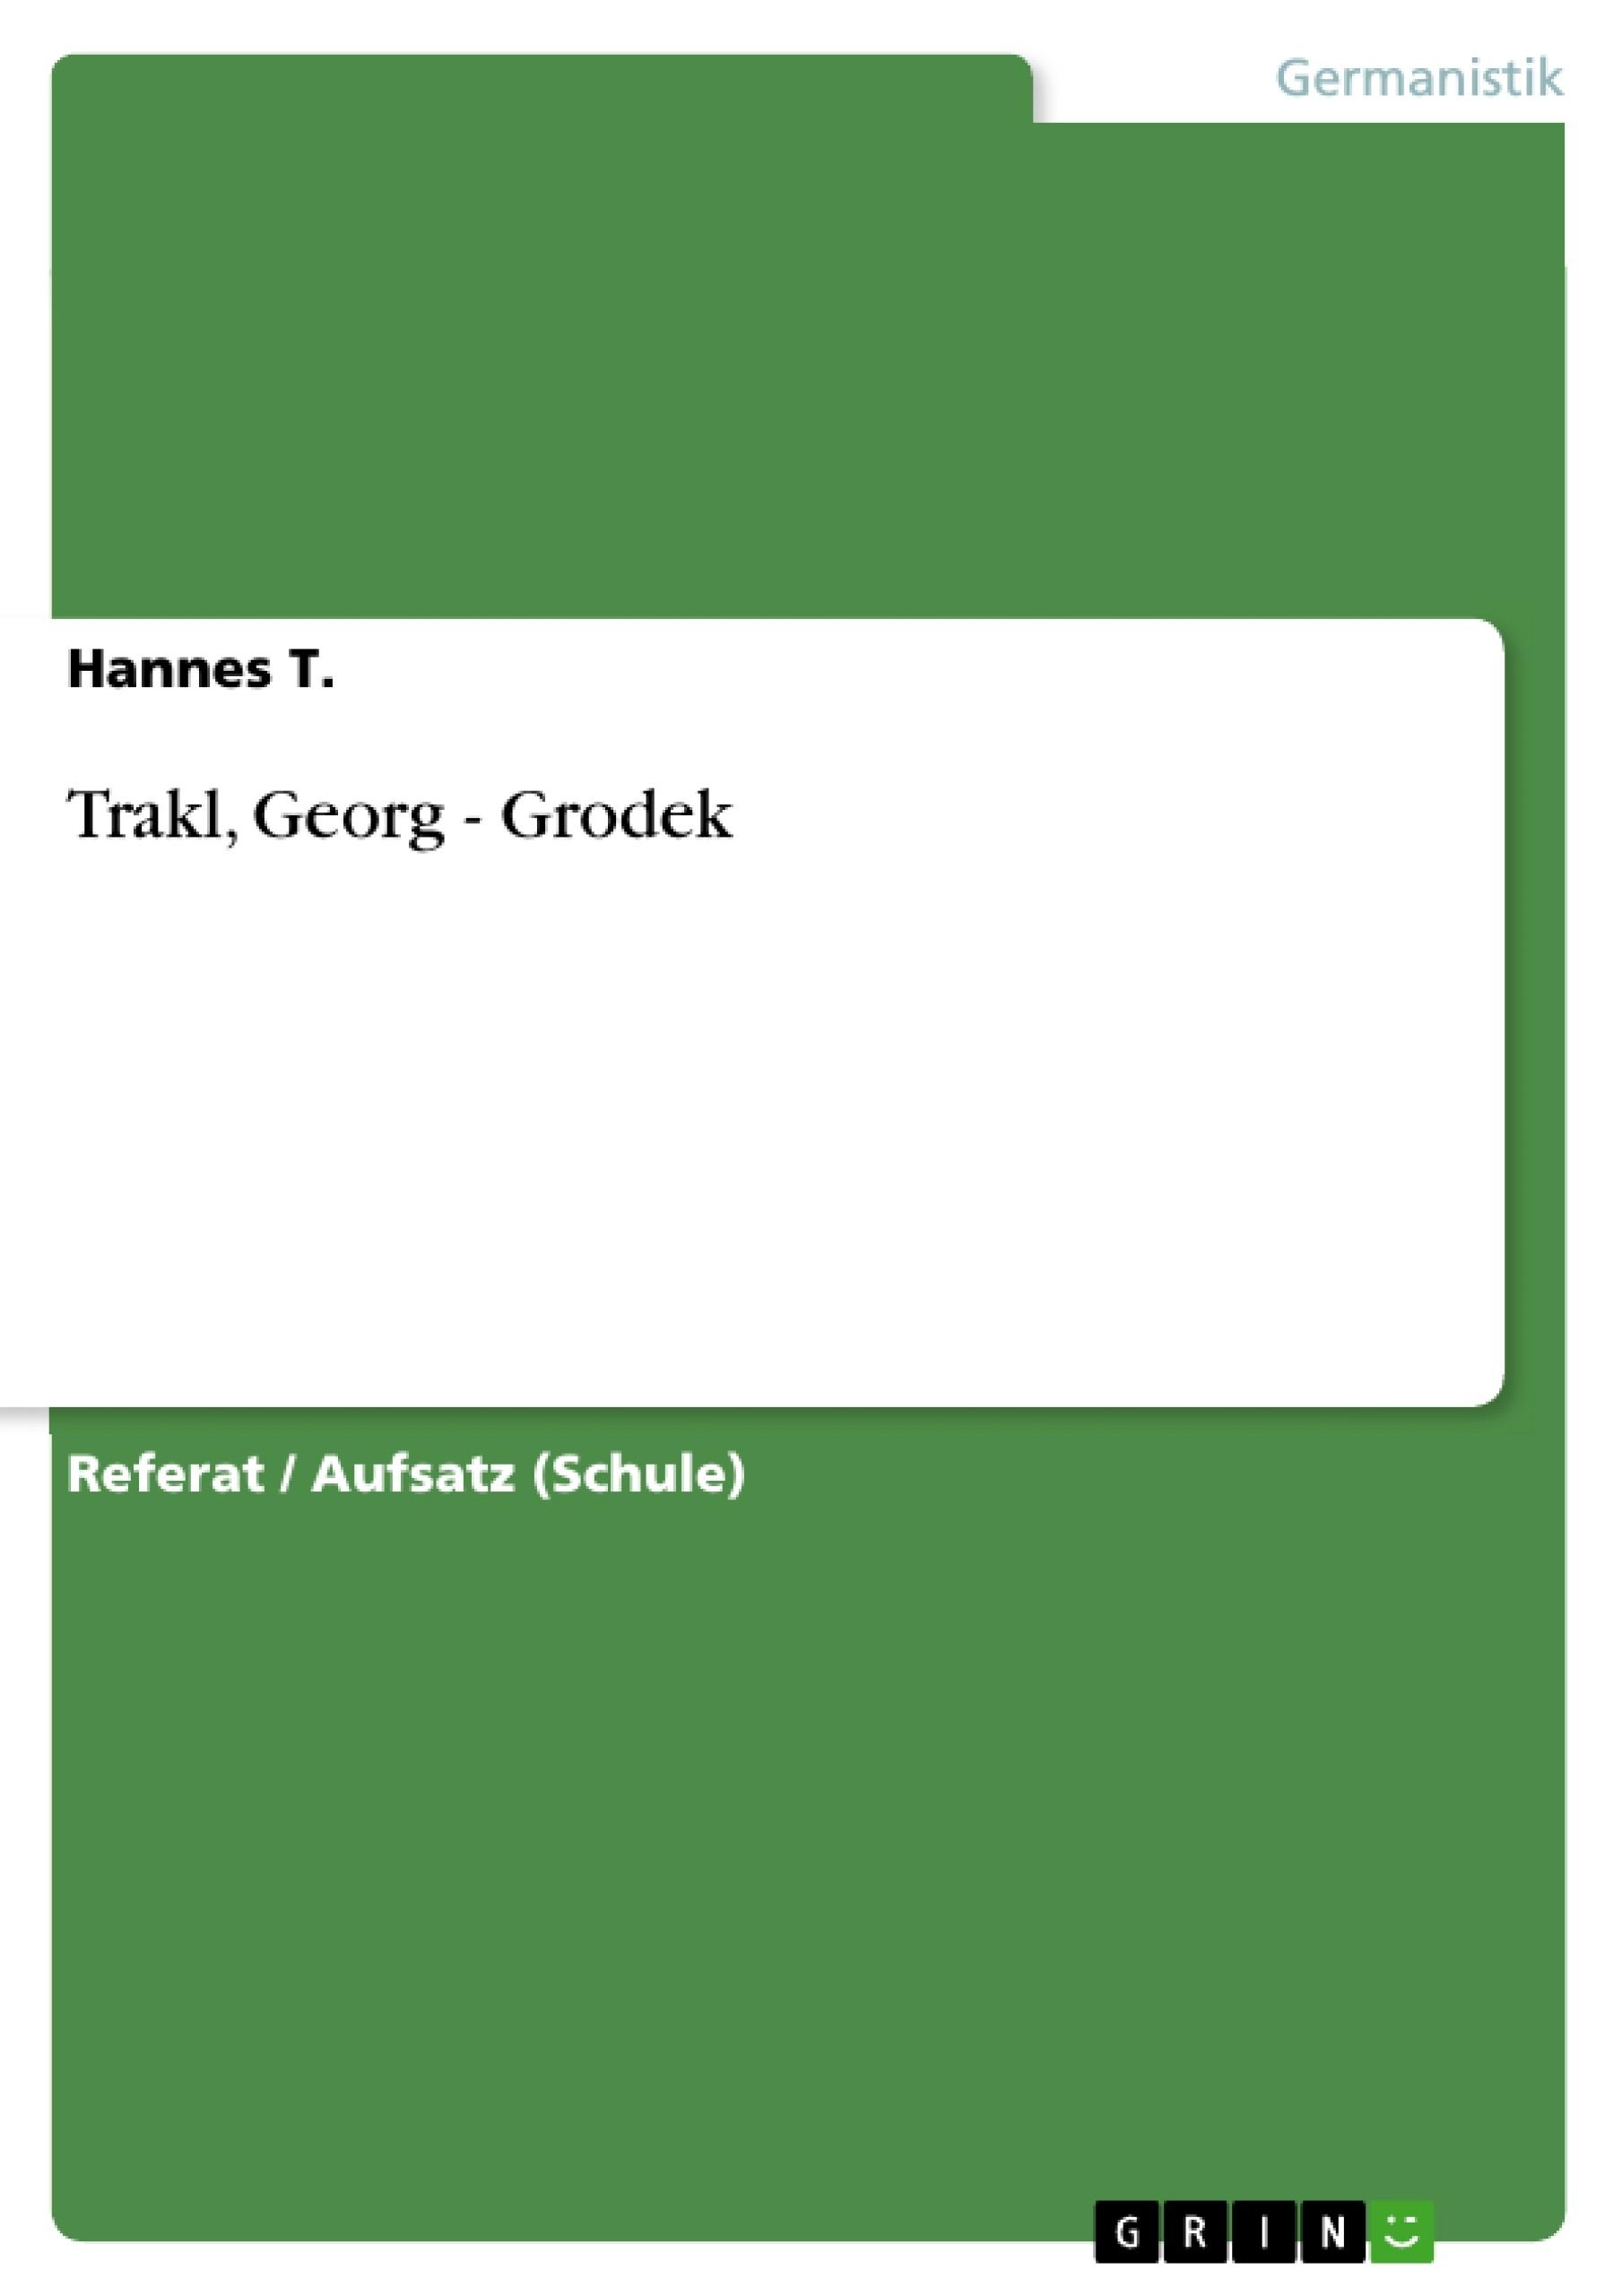 Titel: Trakl, Georg - Grodek